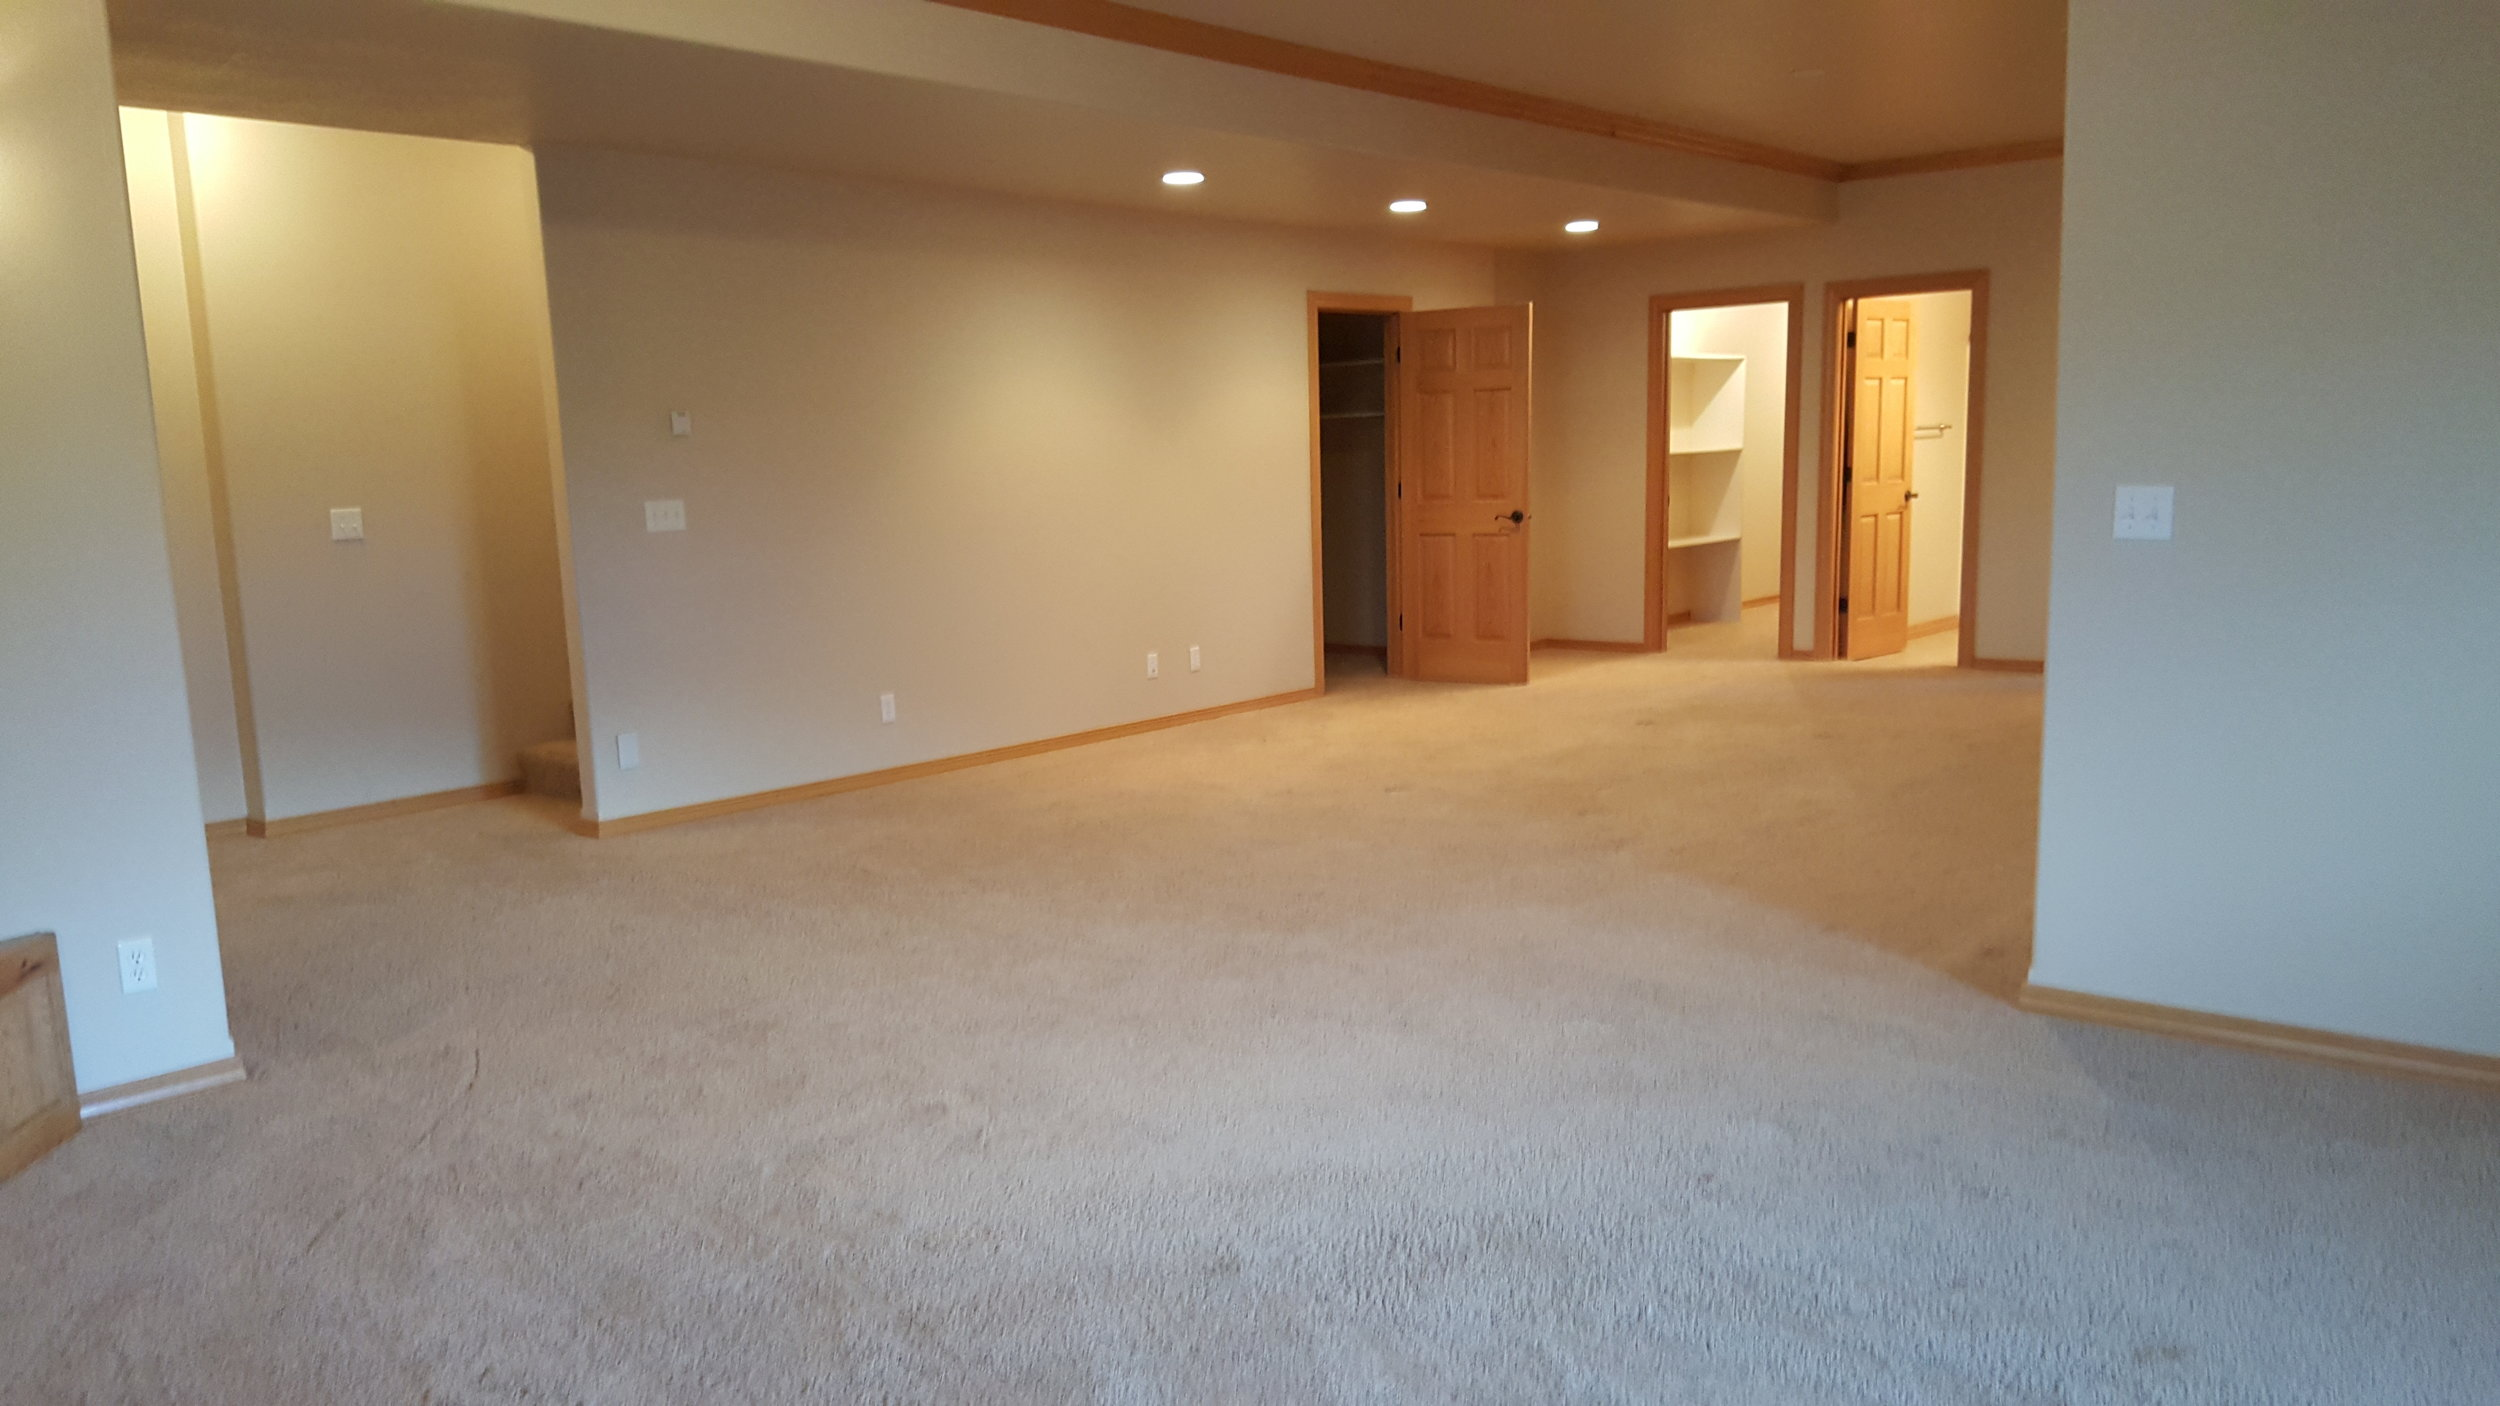 Bigfork basement.jpg